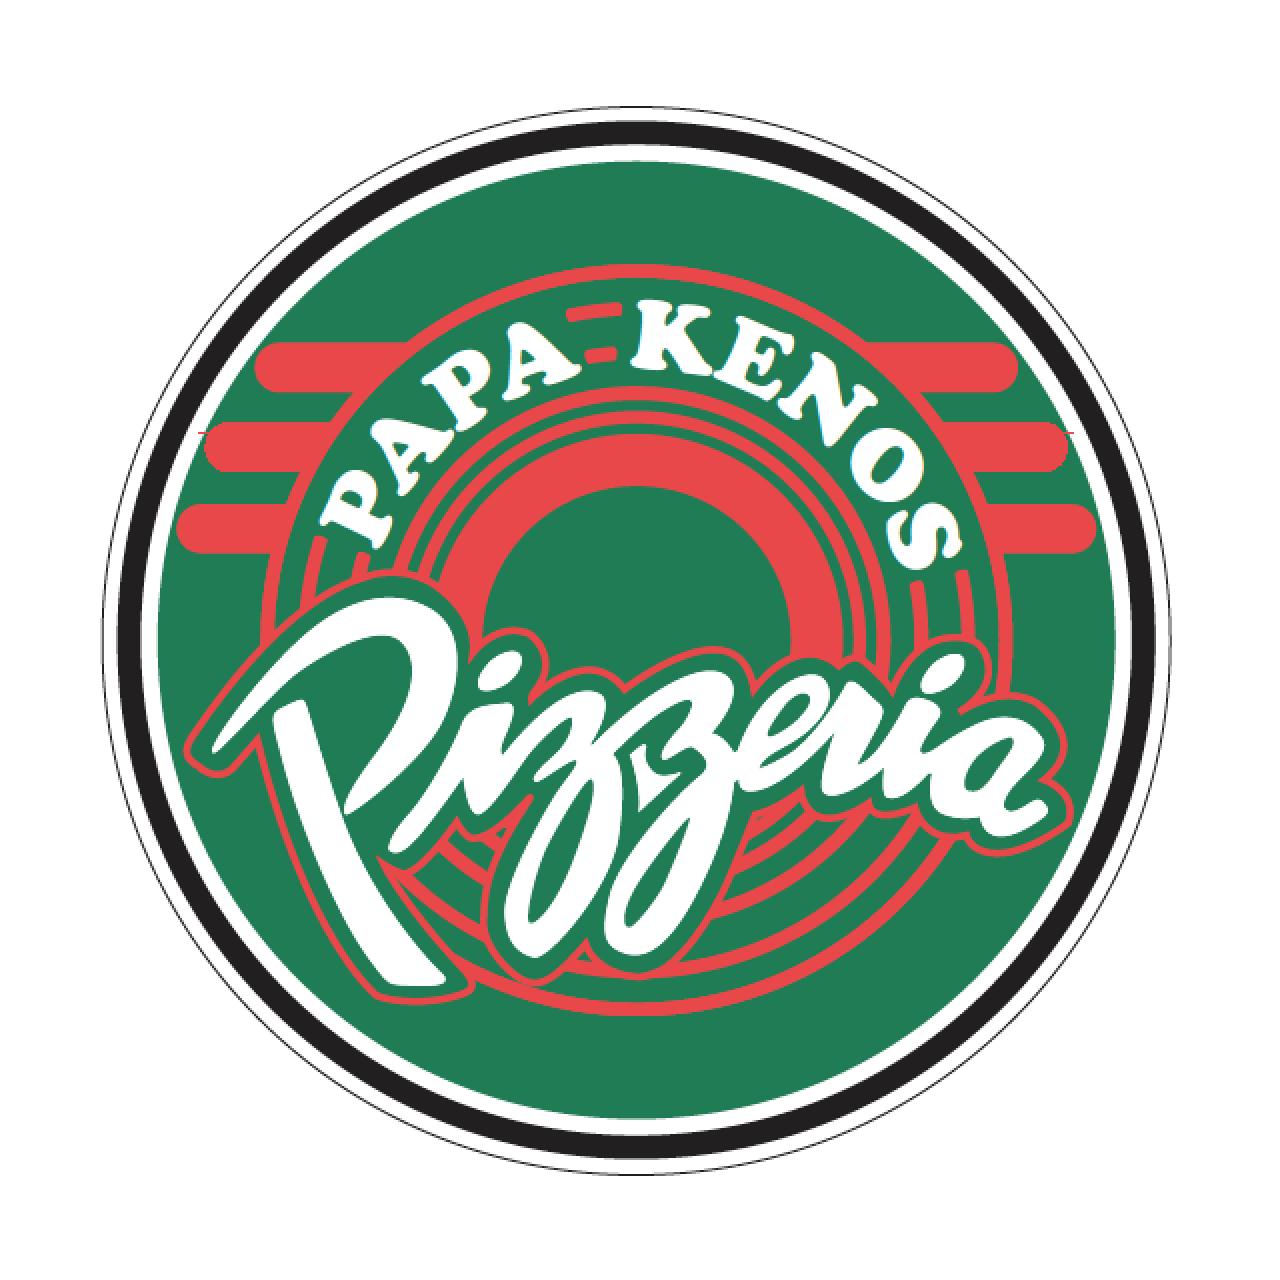 Kansas keno